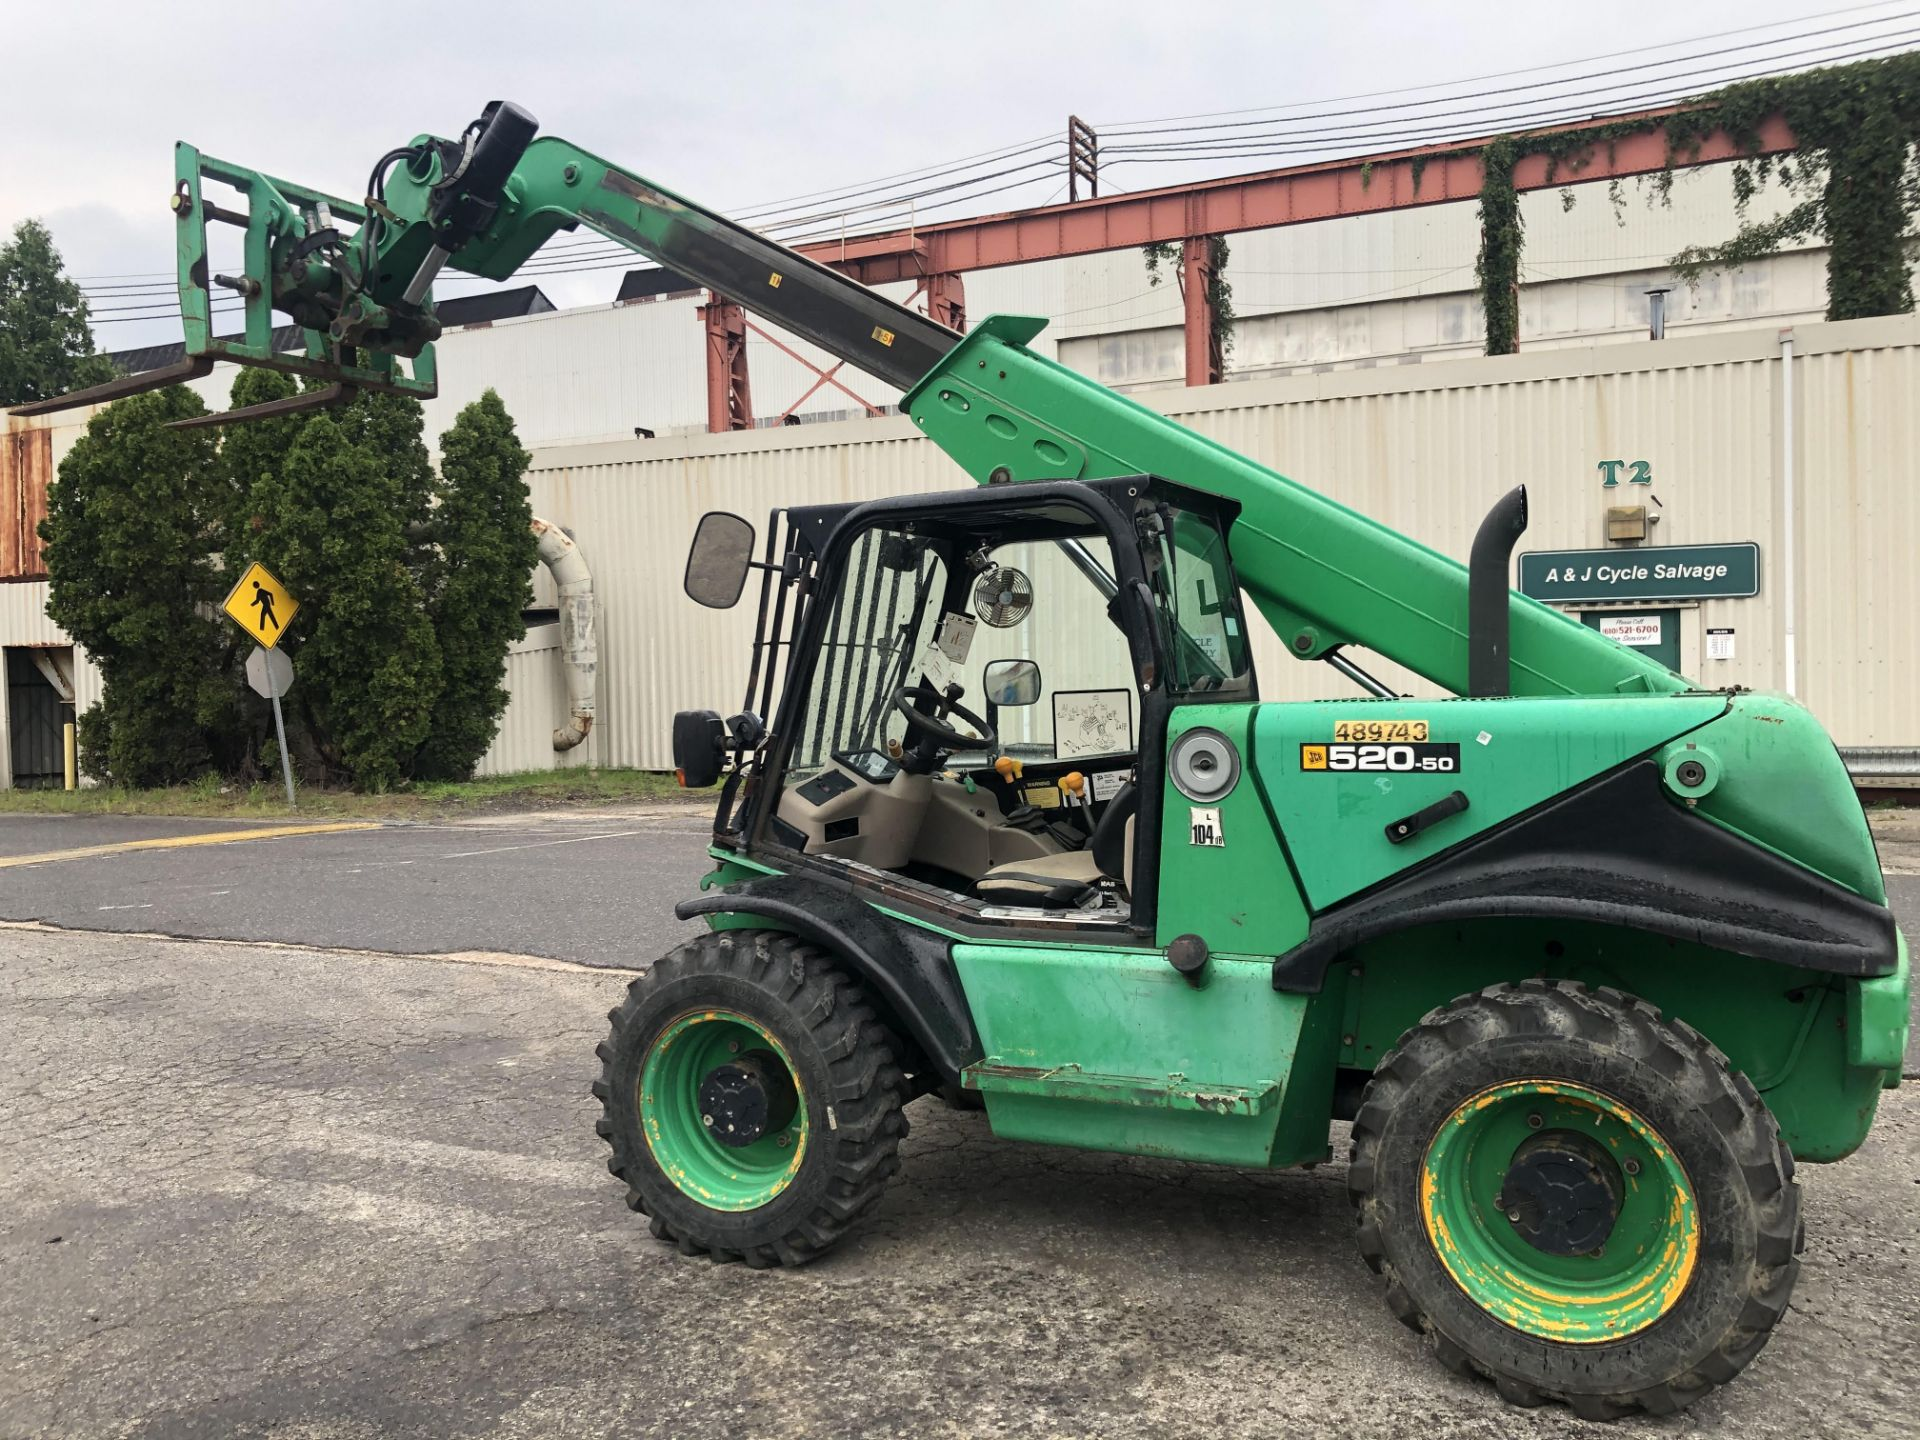 Lot 55 - 2012 JCB 520-50 FORKLIFT